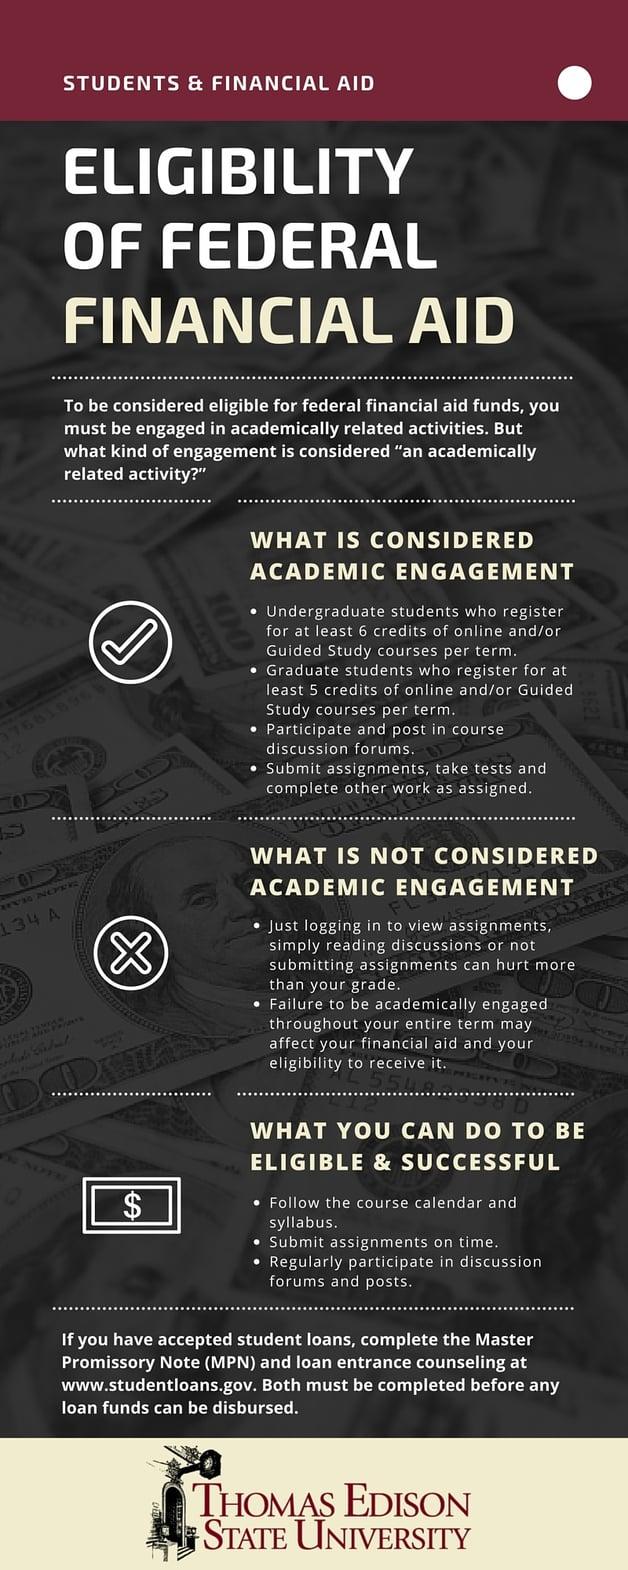 Thomas Edison State University Eligibility of Federal Financial Aid